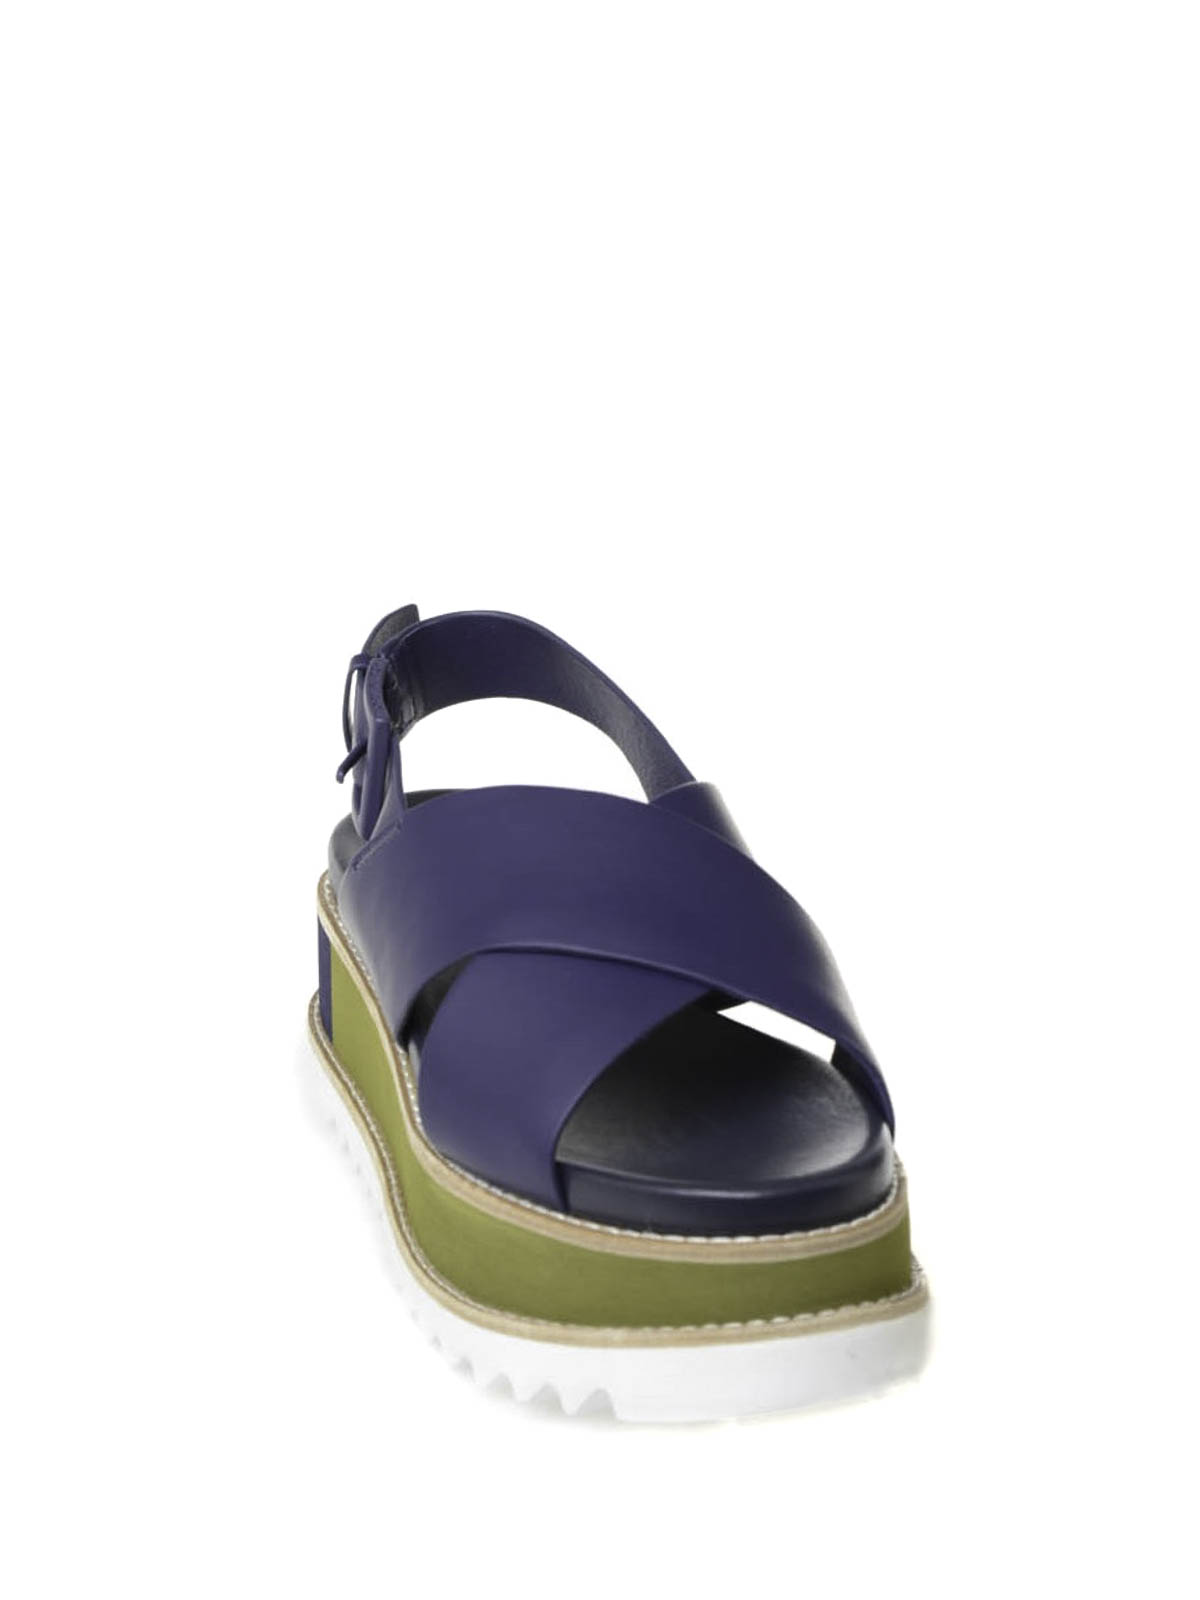 7c0cef145 Tory Burch - Gloriette platform leather sandal - sandals - 52158211 412